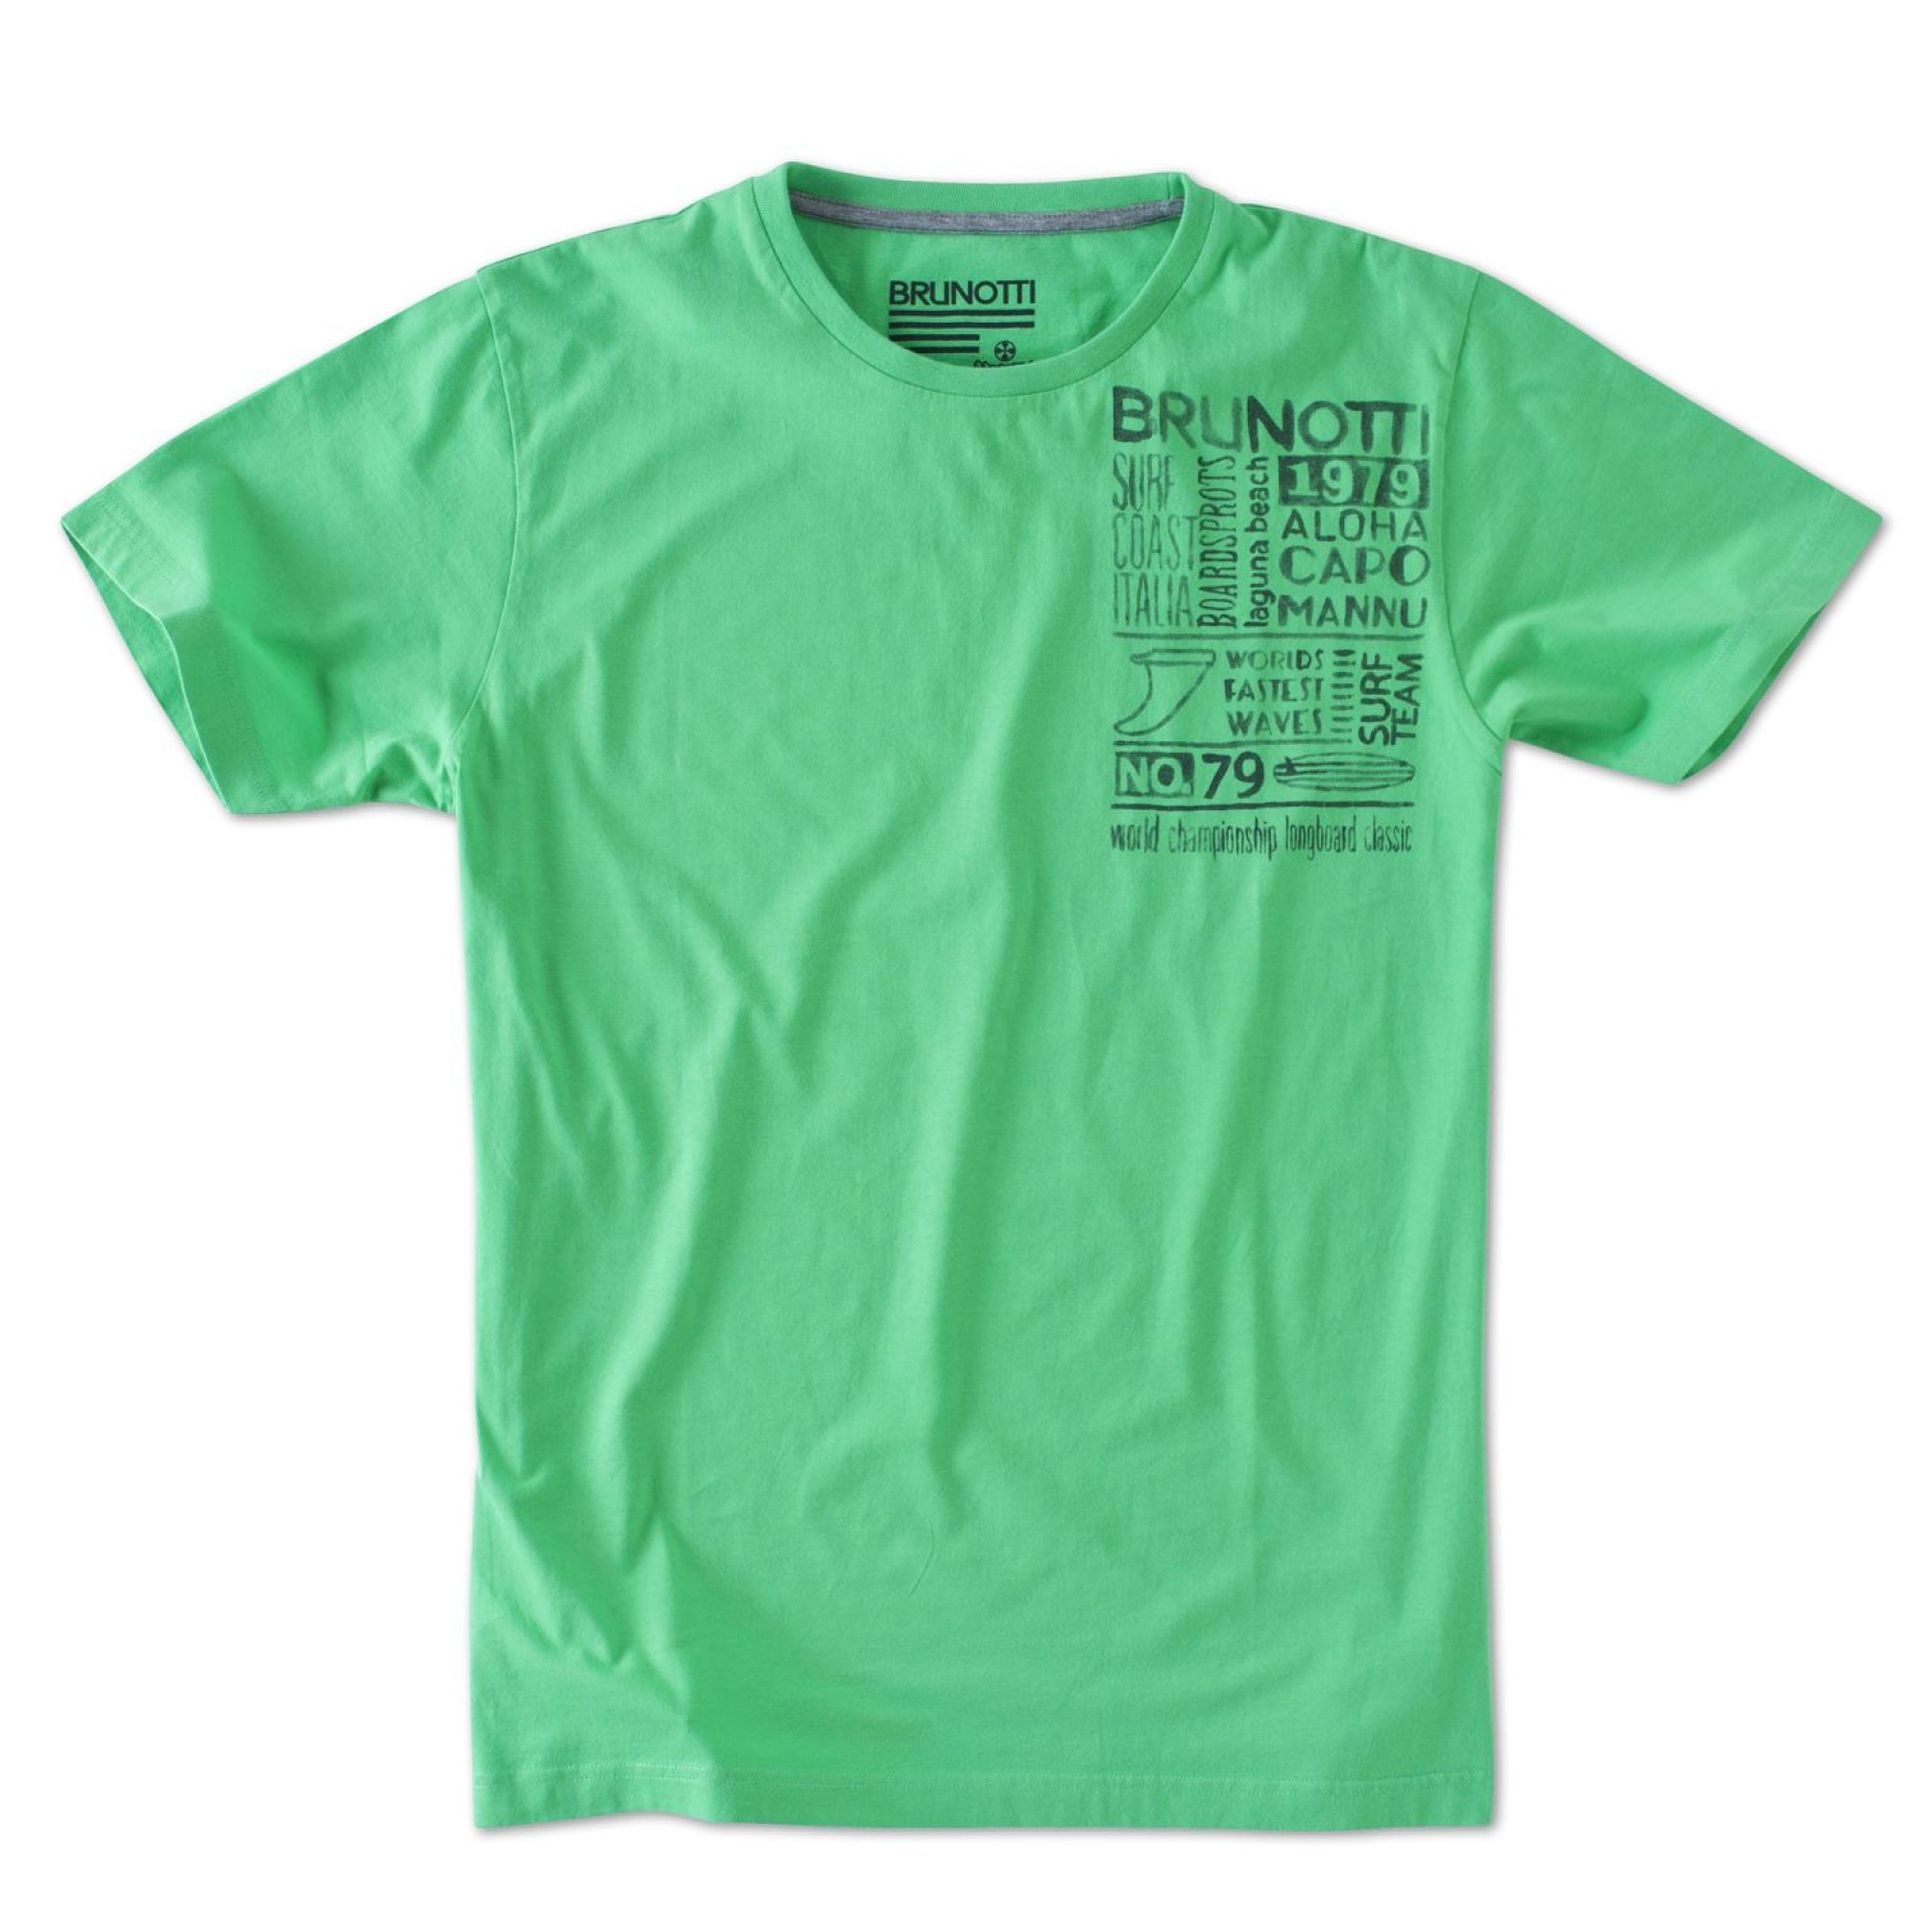 T-shirt Brunotti Altaro P-6011 Zielony